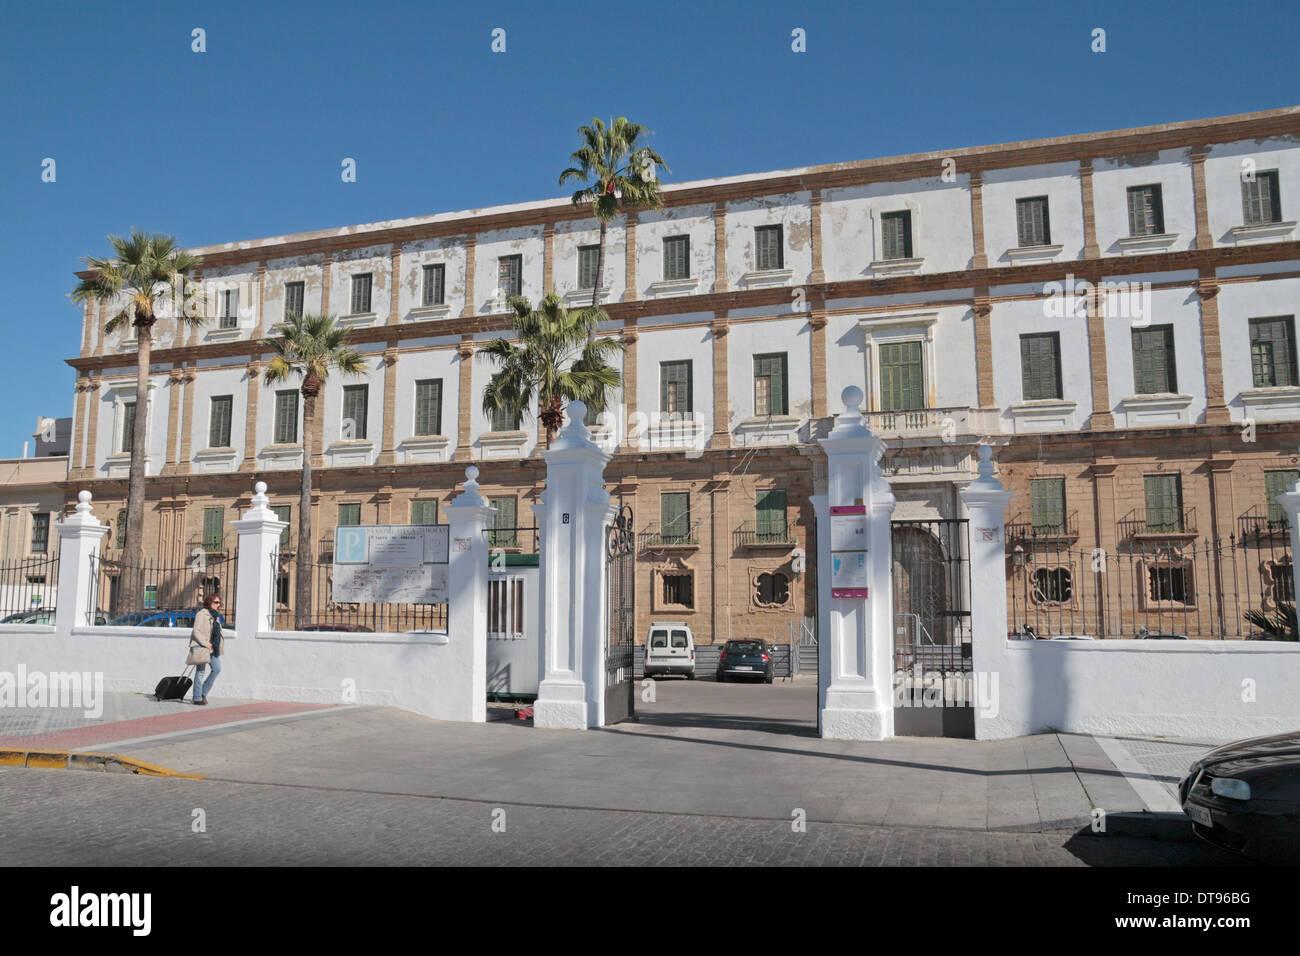 The former Hospice (Antiguo Hospicio) in Cadiz, Andalusia, Spain. - Stock Image